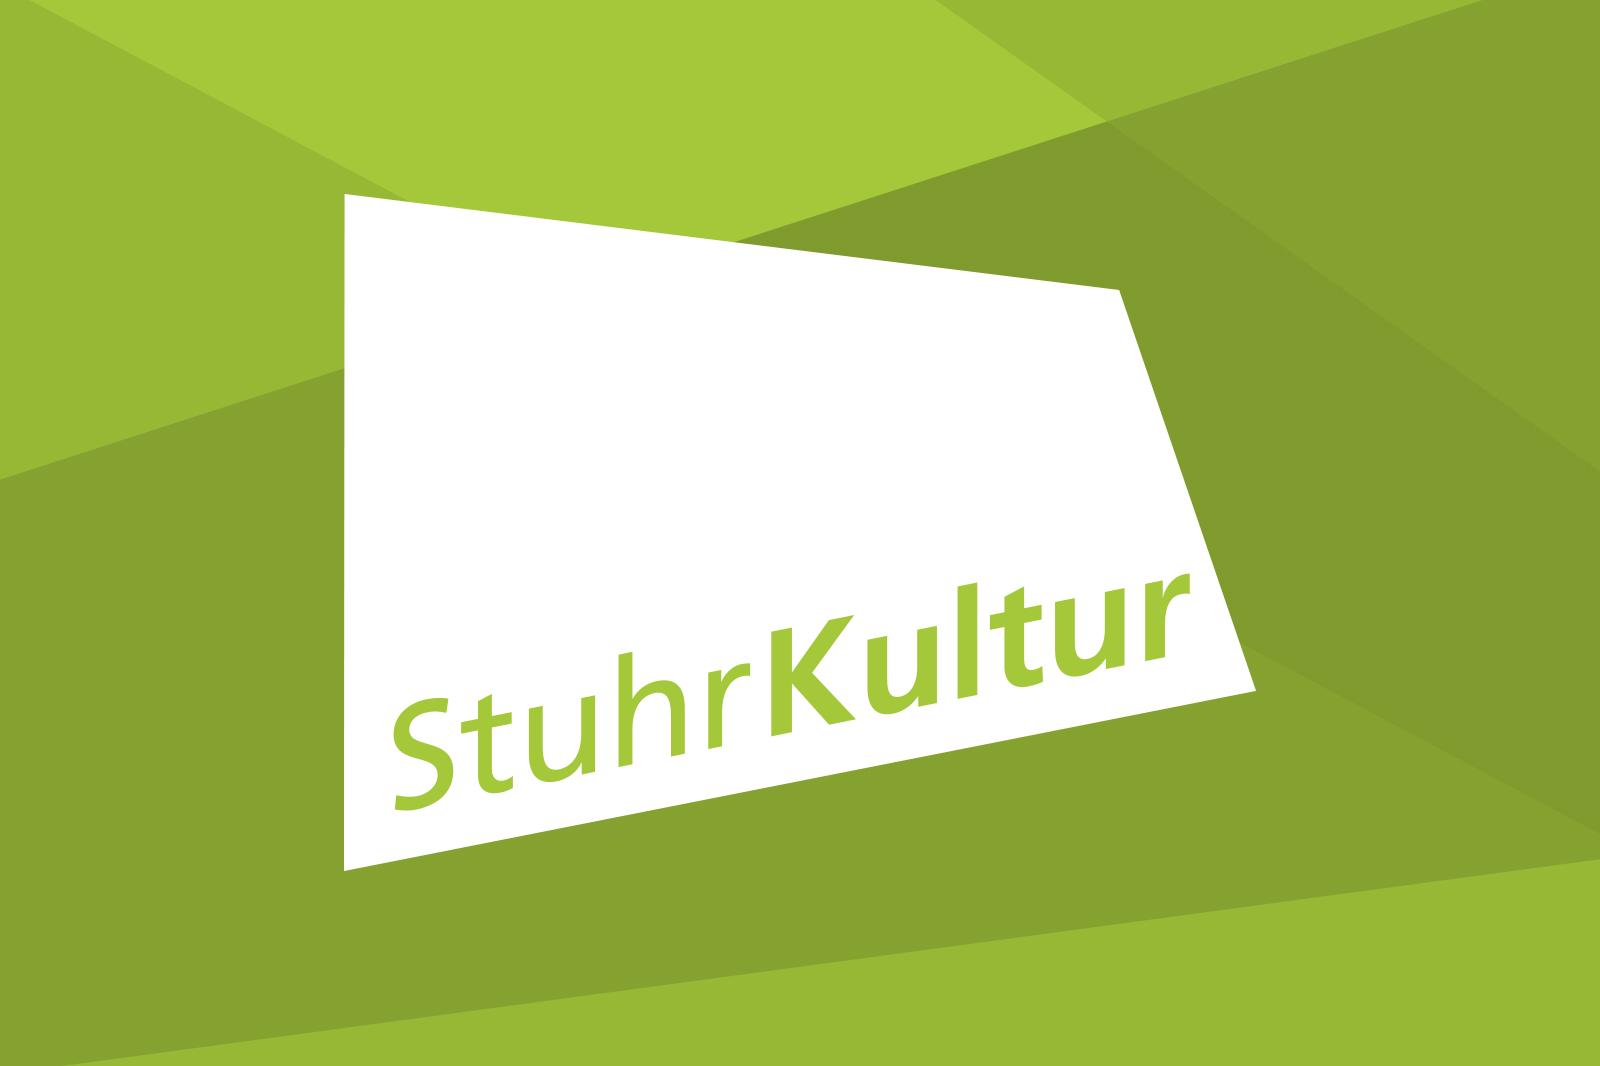 StuhrKultur-logo-gestaltung-werbeagentur-verden-bremen